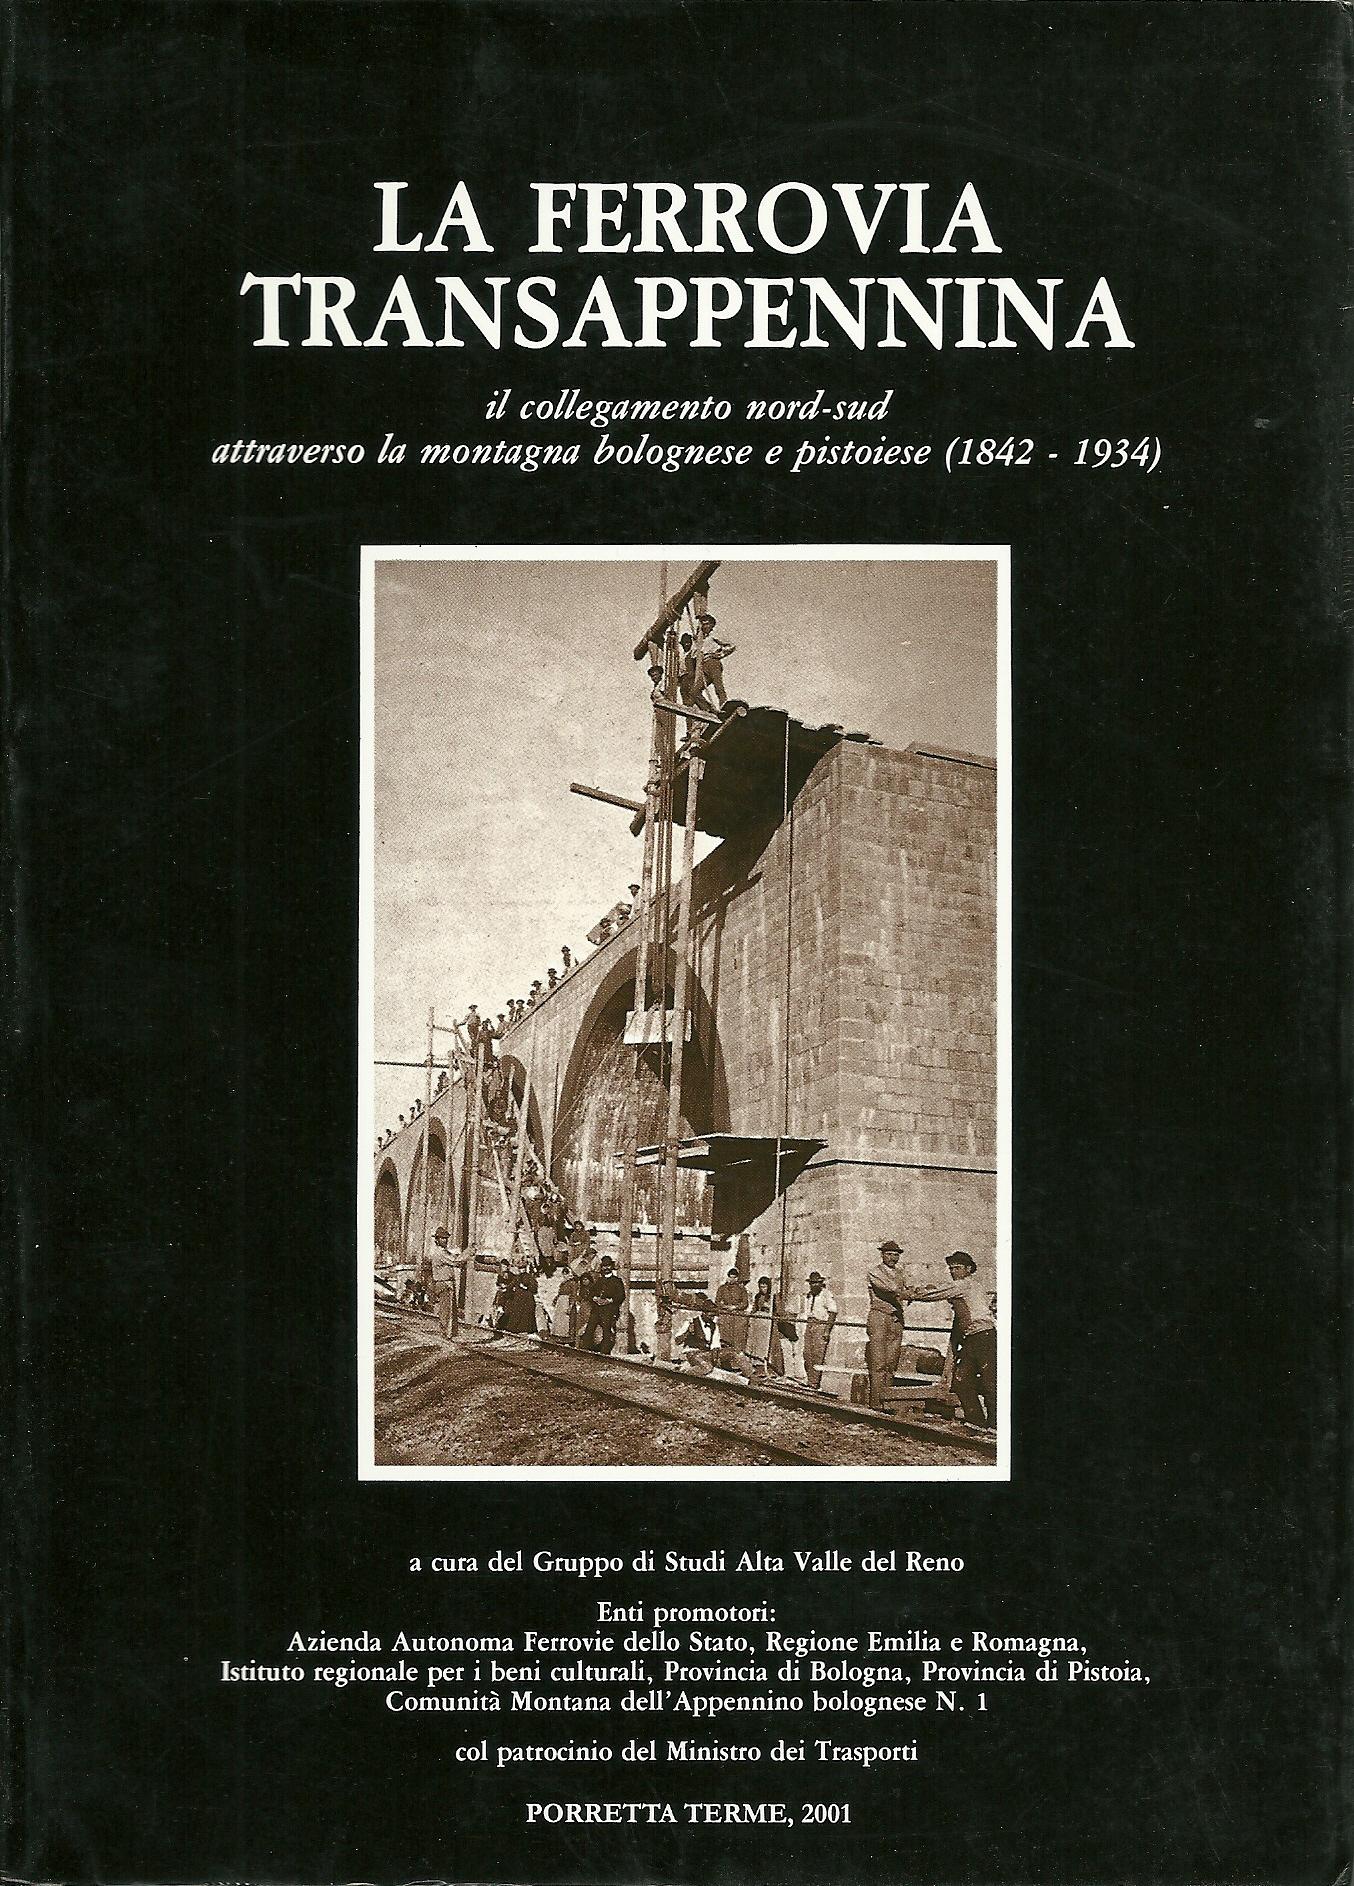 La Ferrovia Transappennina